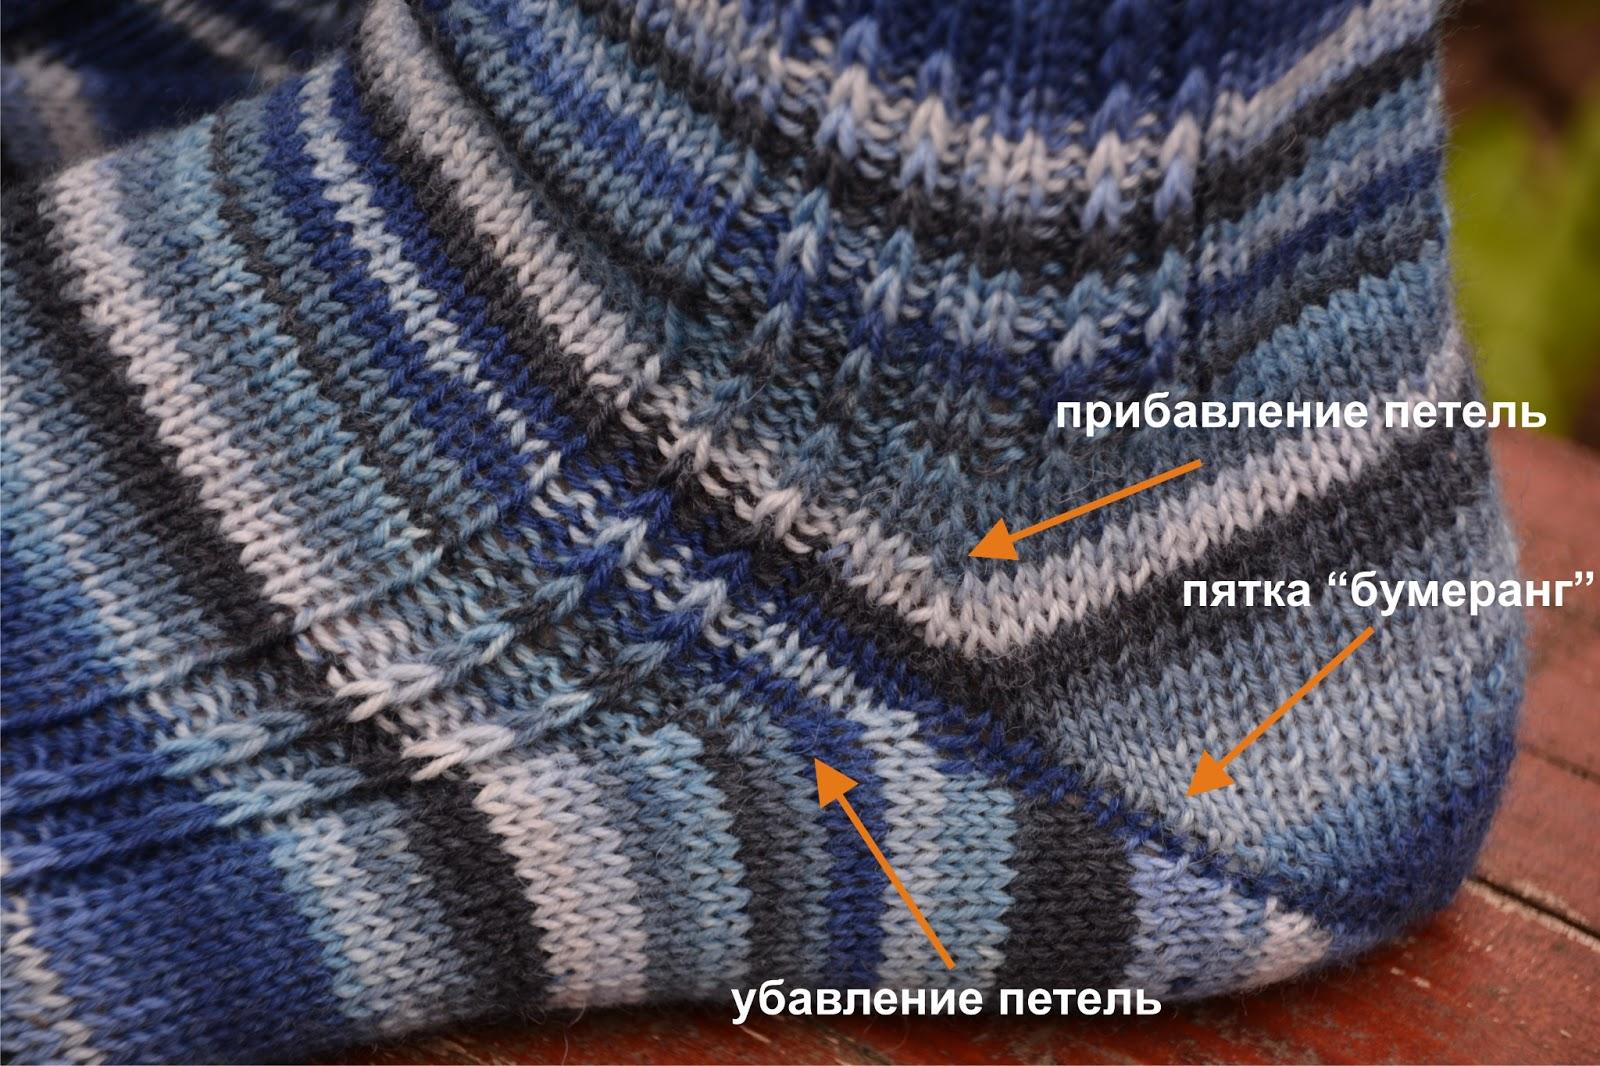 Носки спицами схемы пятка бумеранг